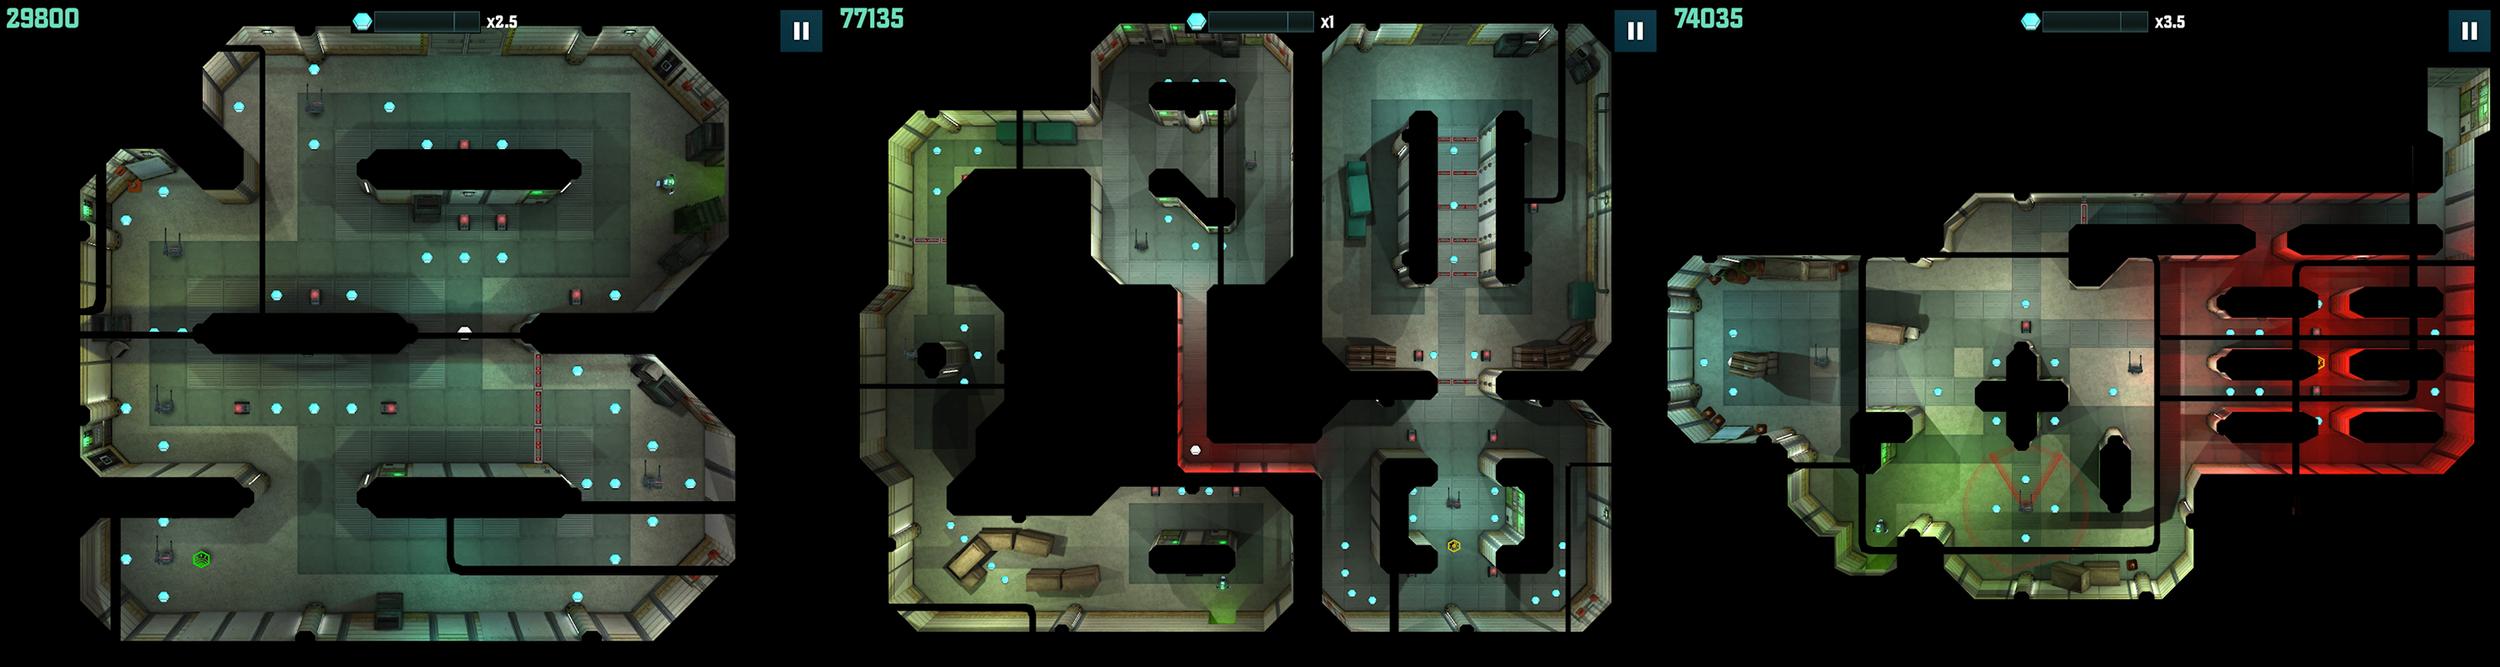 spider-bot-levels-01.png